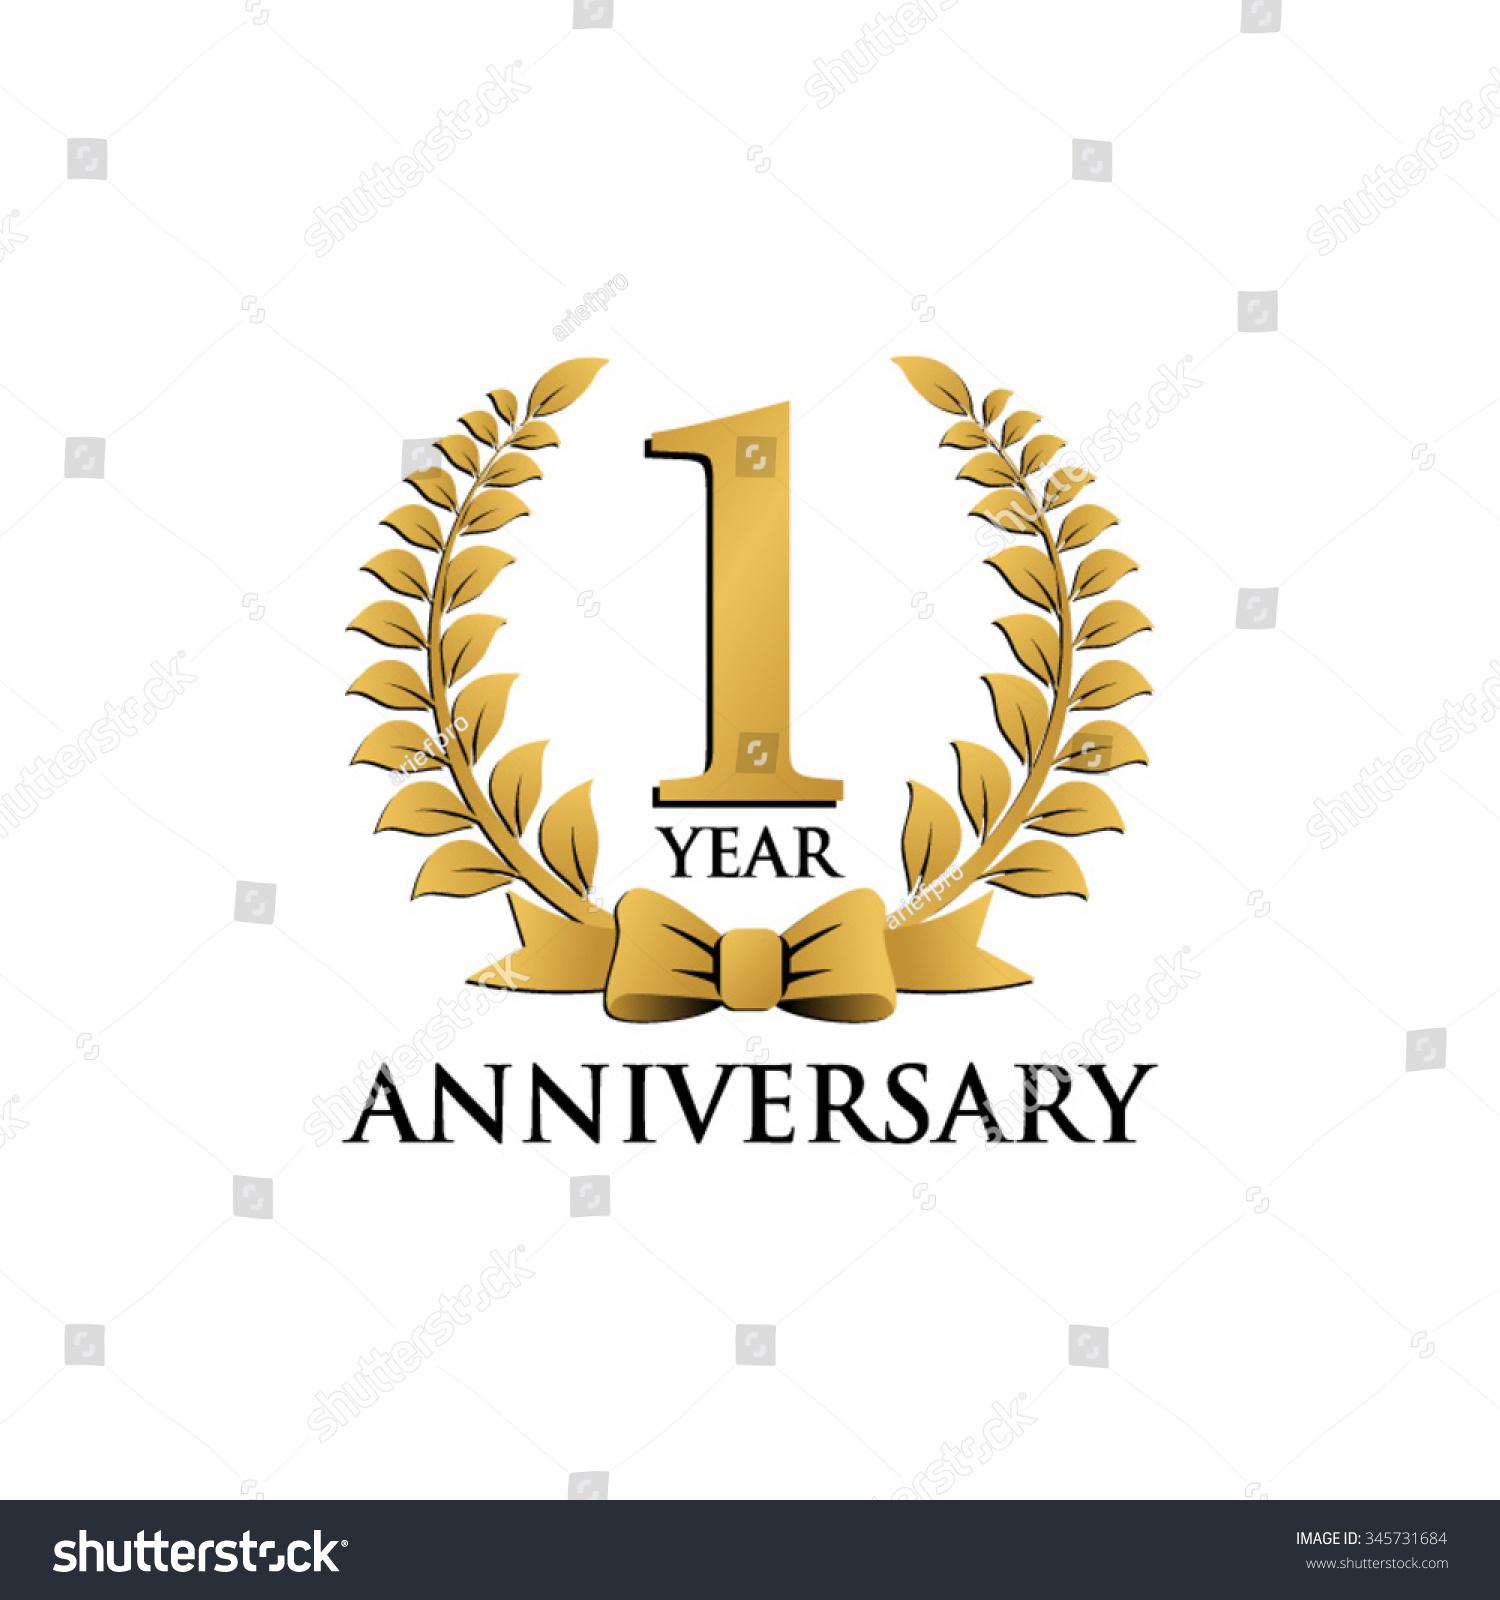 Year anniversary wreath ribbon logo stock vector